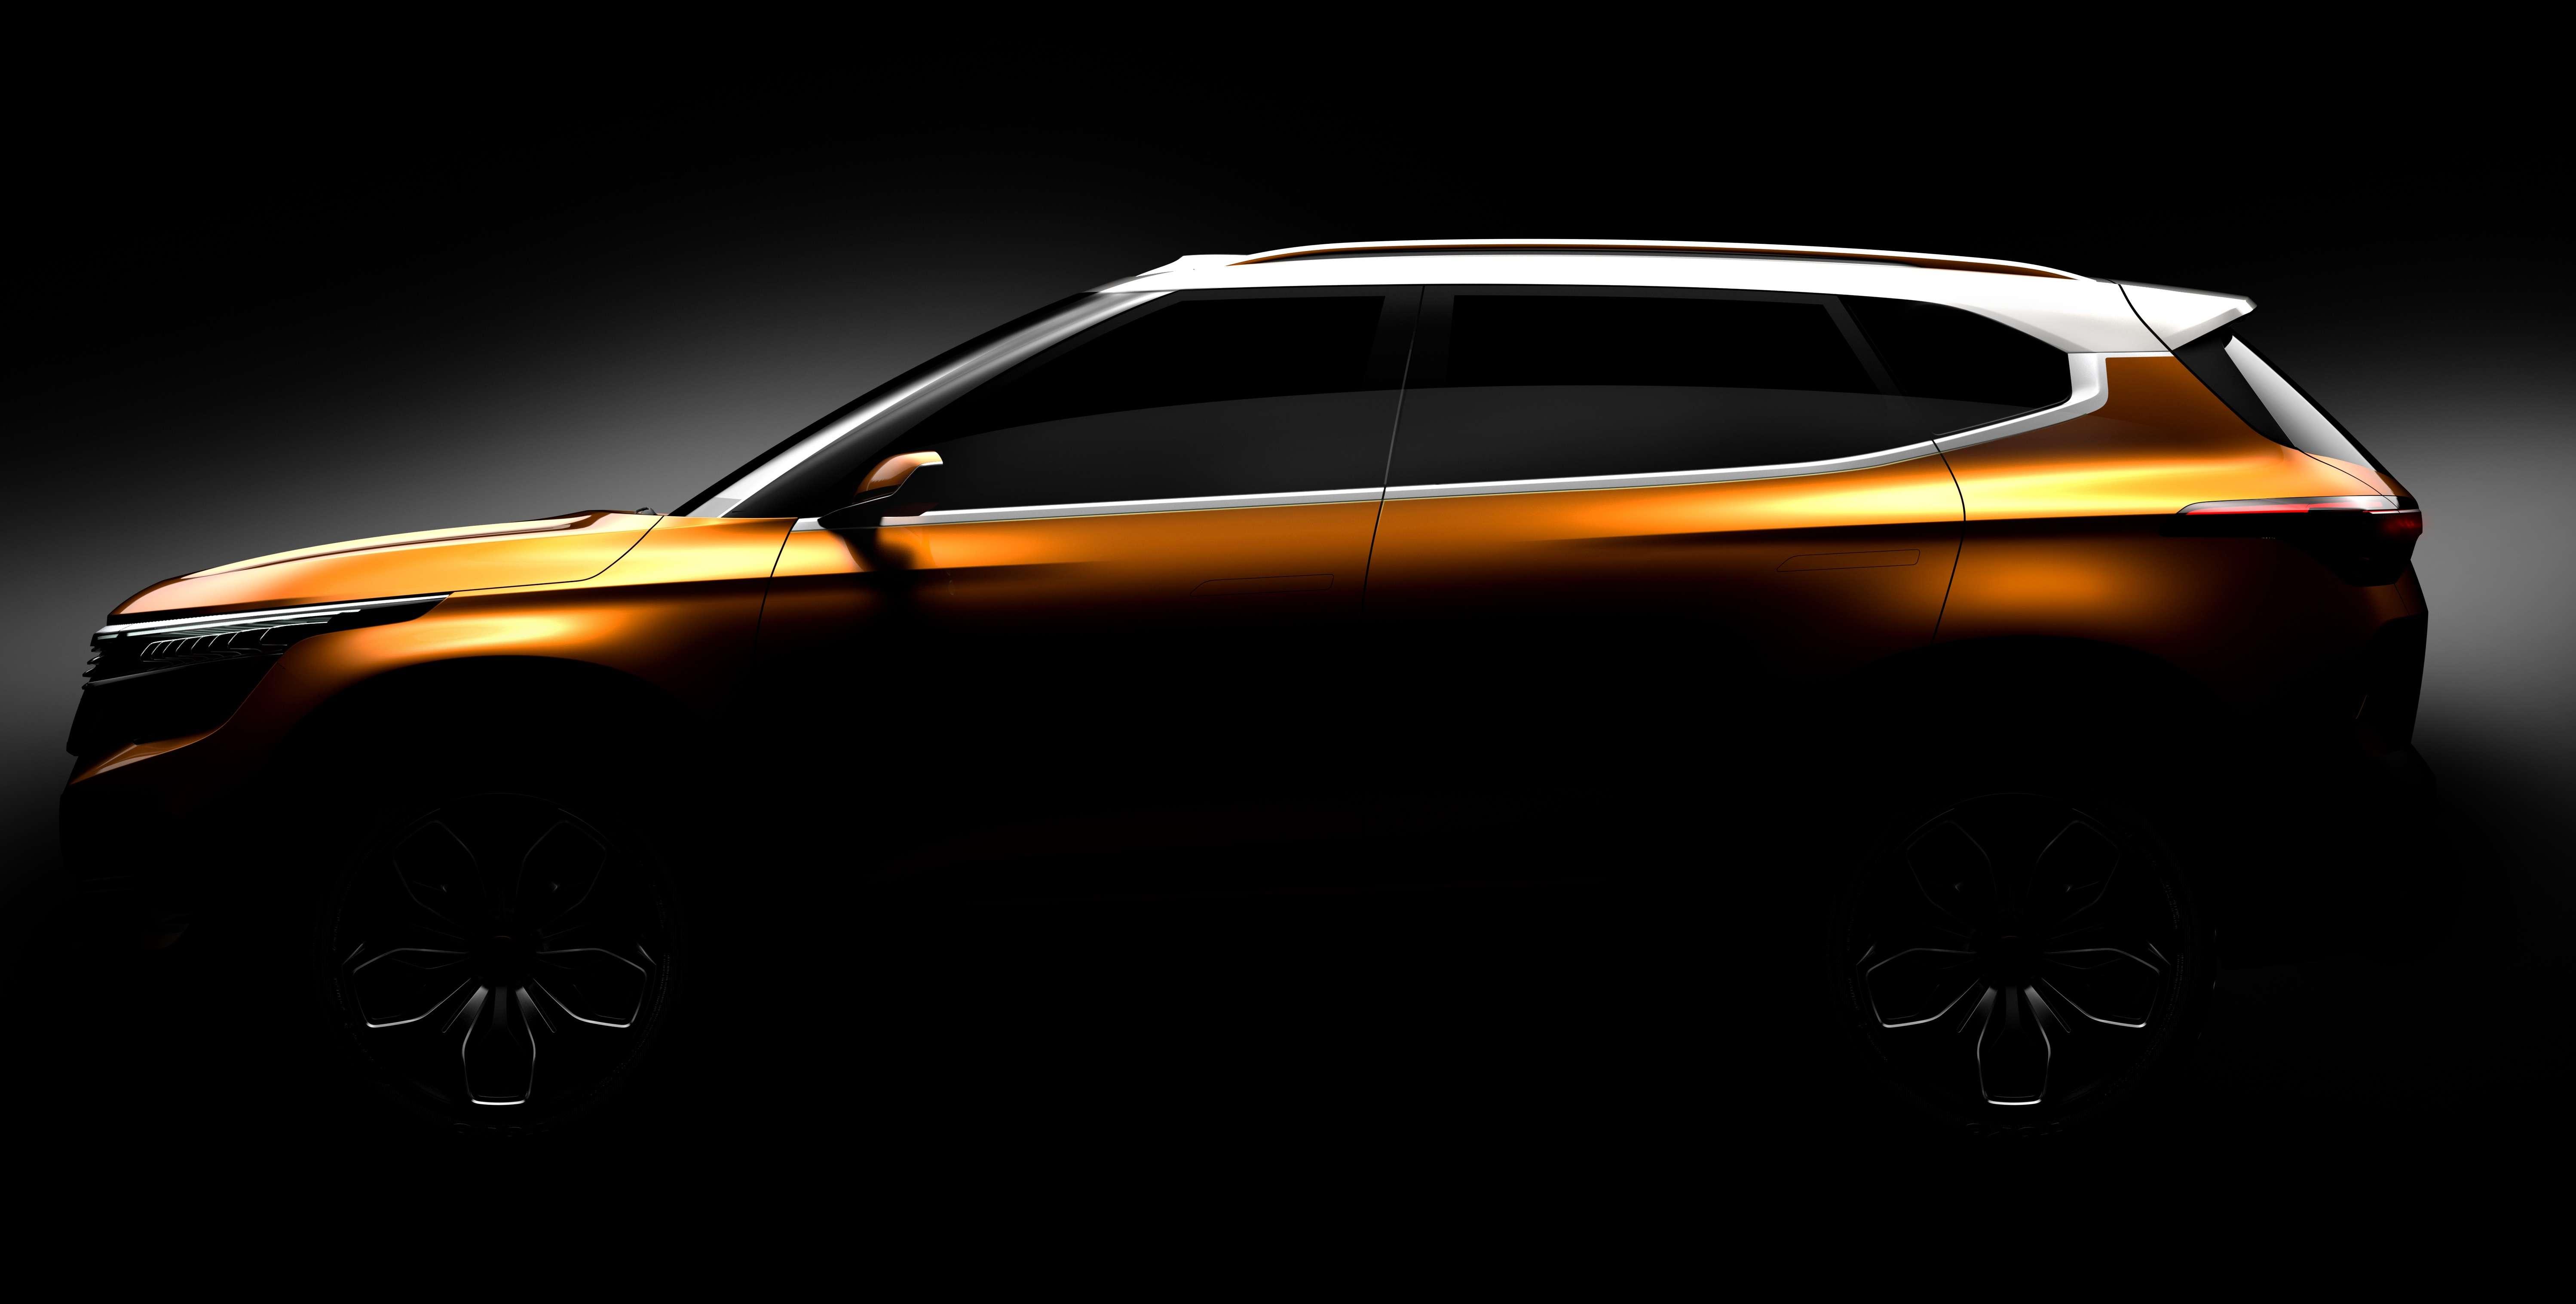 Car Expo Standsay : Kia sp concept auto expo kia motors to showcase global